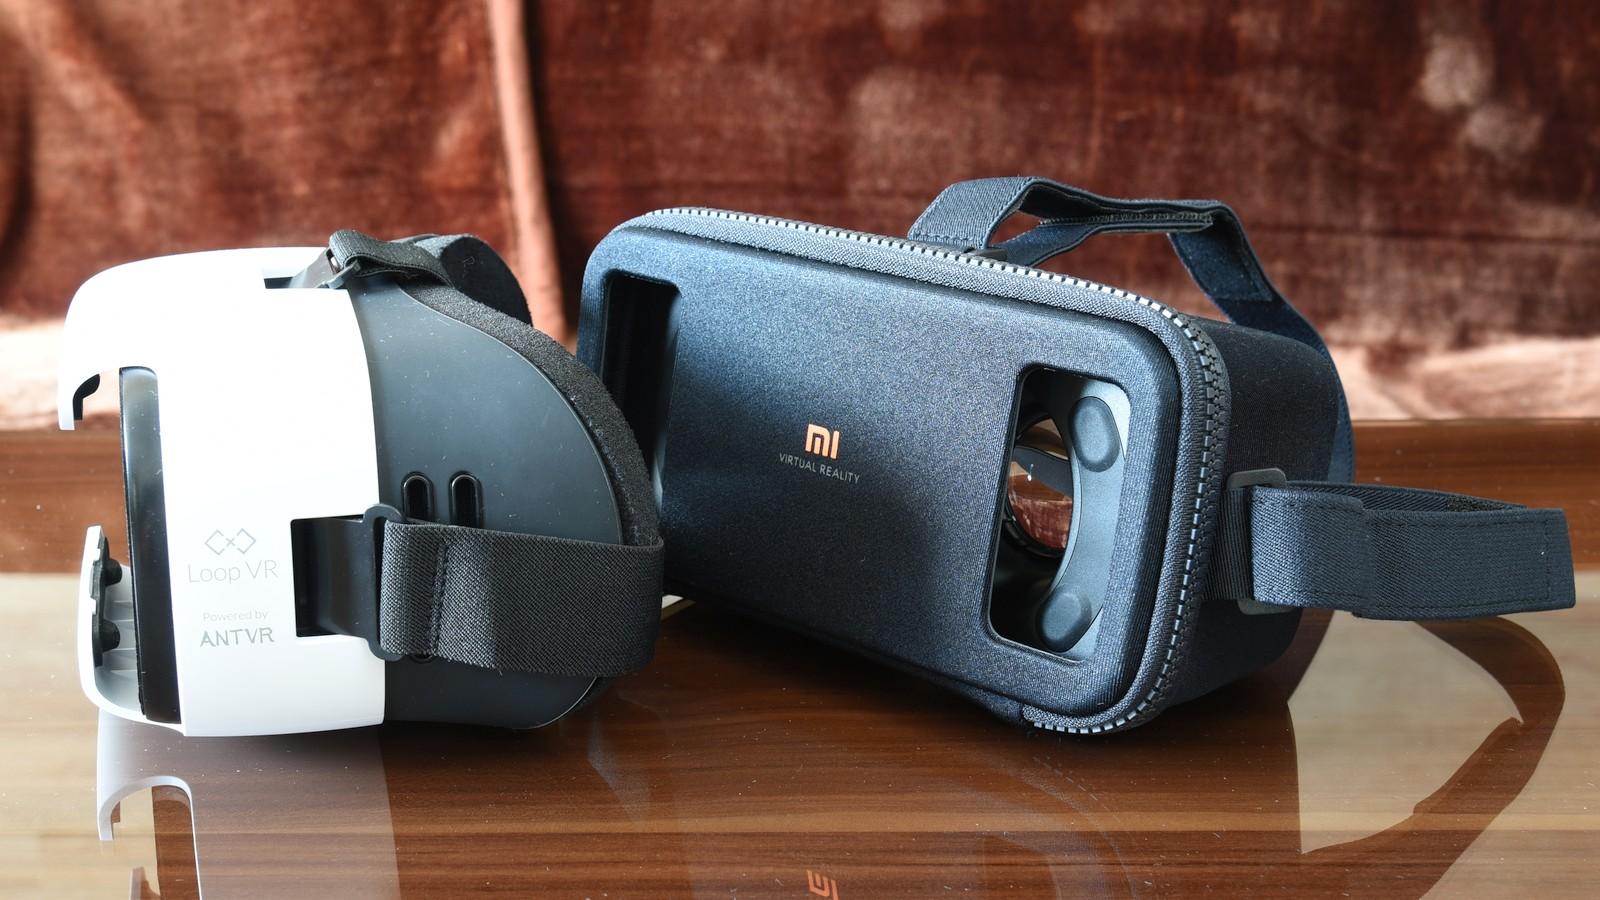 7fb1c02ba Okuliare OnePlus Loop VR a Xiaomi VR - virtuálna realita do 30 eur Zdroj:  www.fony.sk